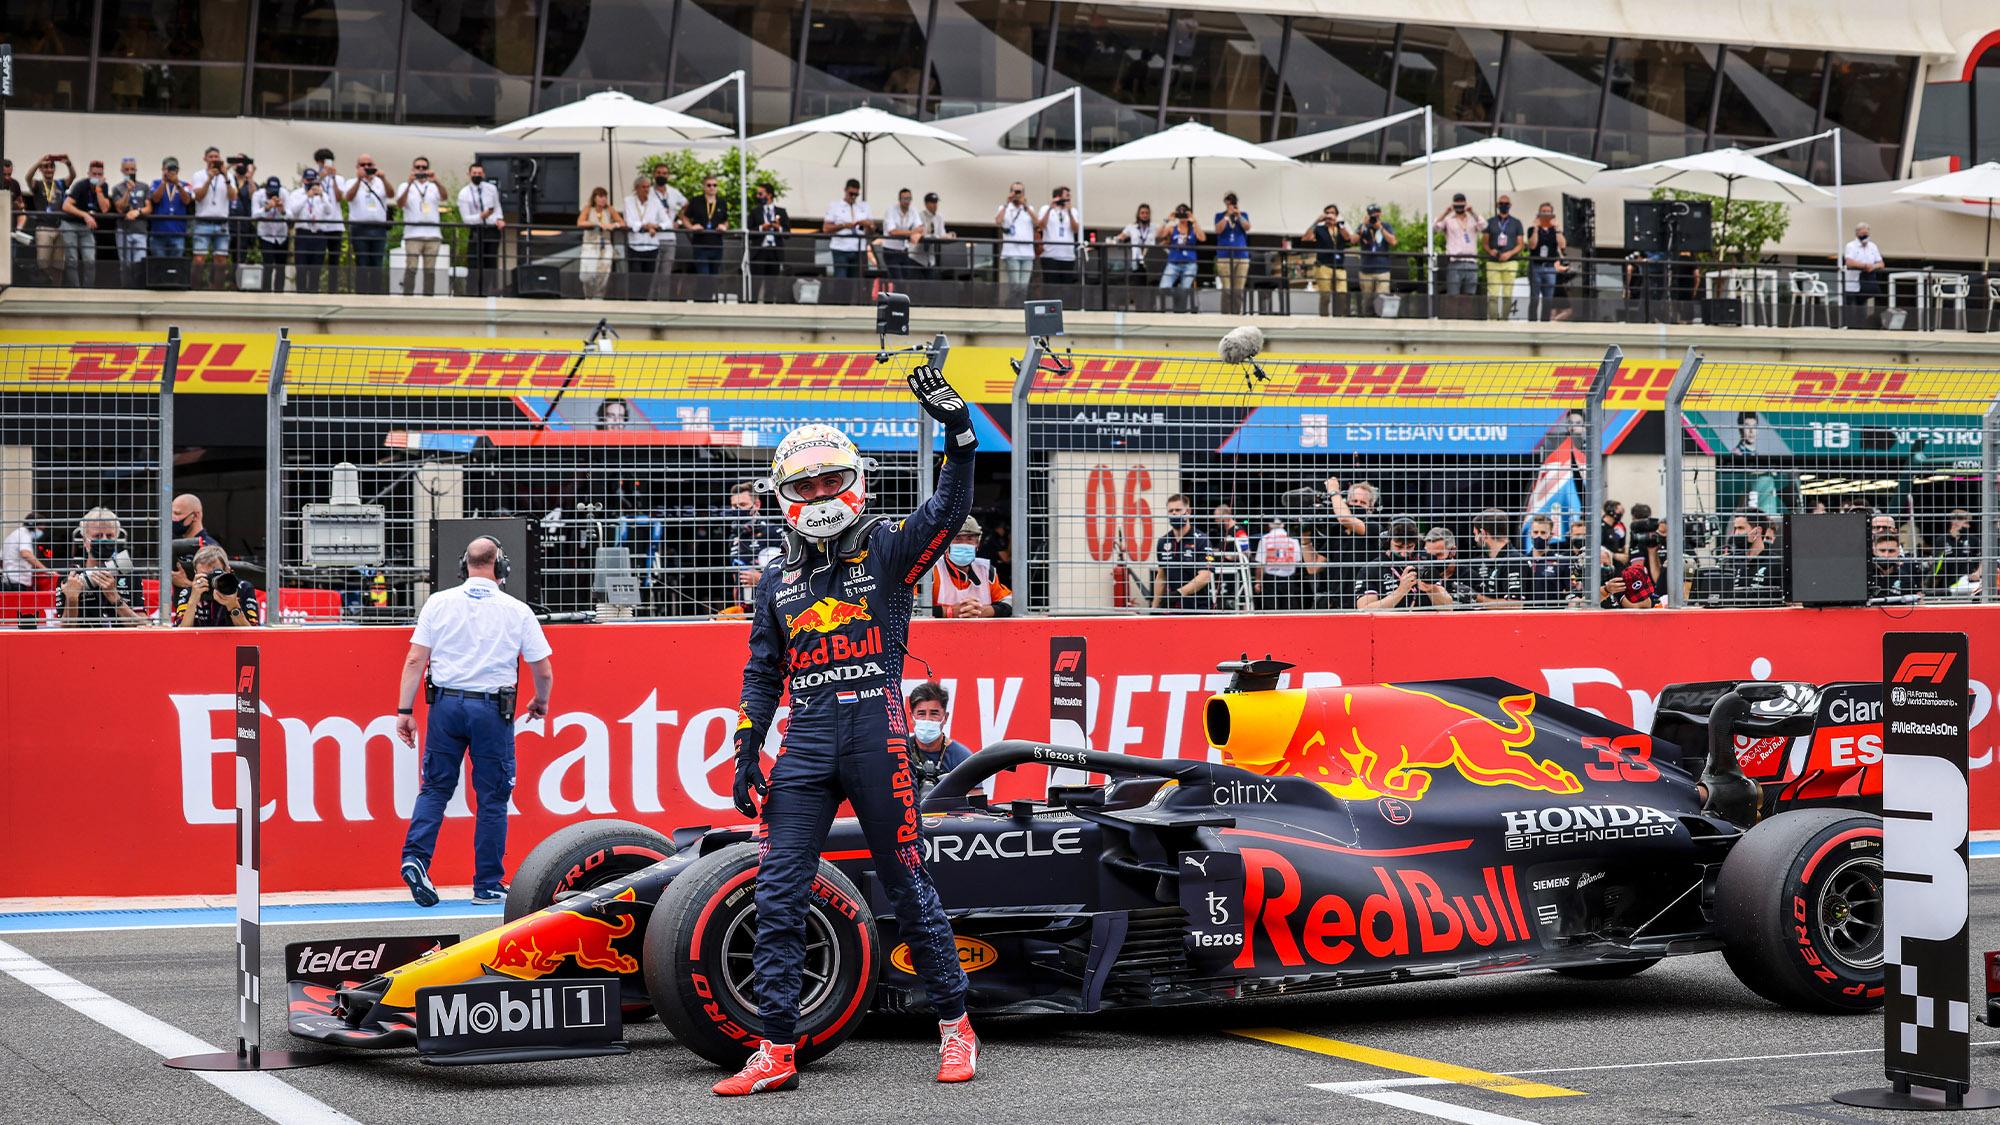 Max Verstappen celebrates pole at the 2021 French Grand Prix